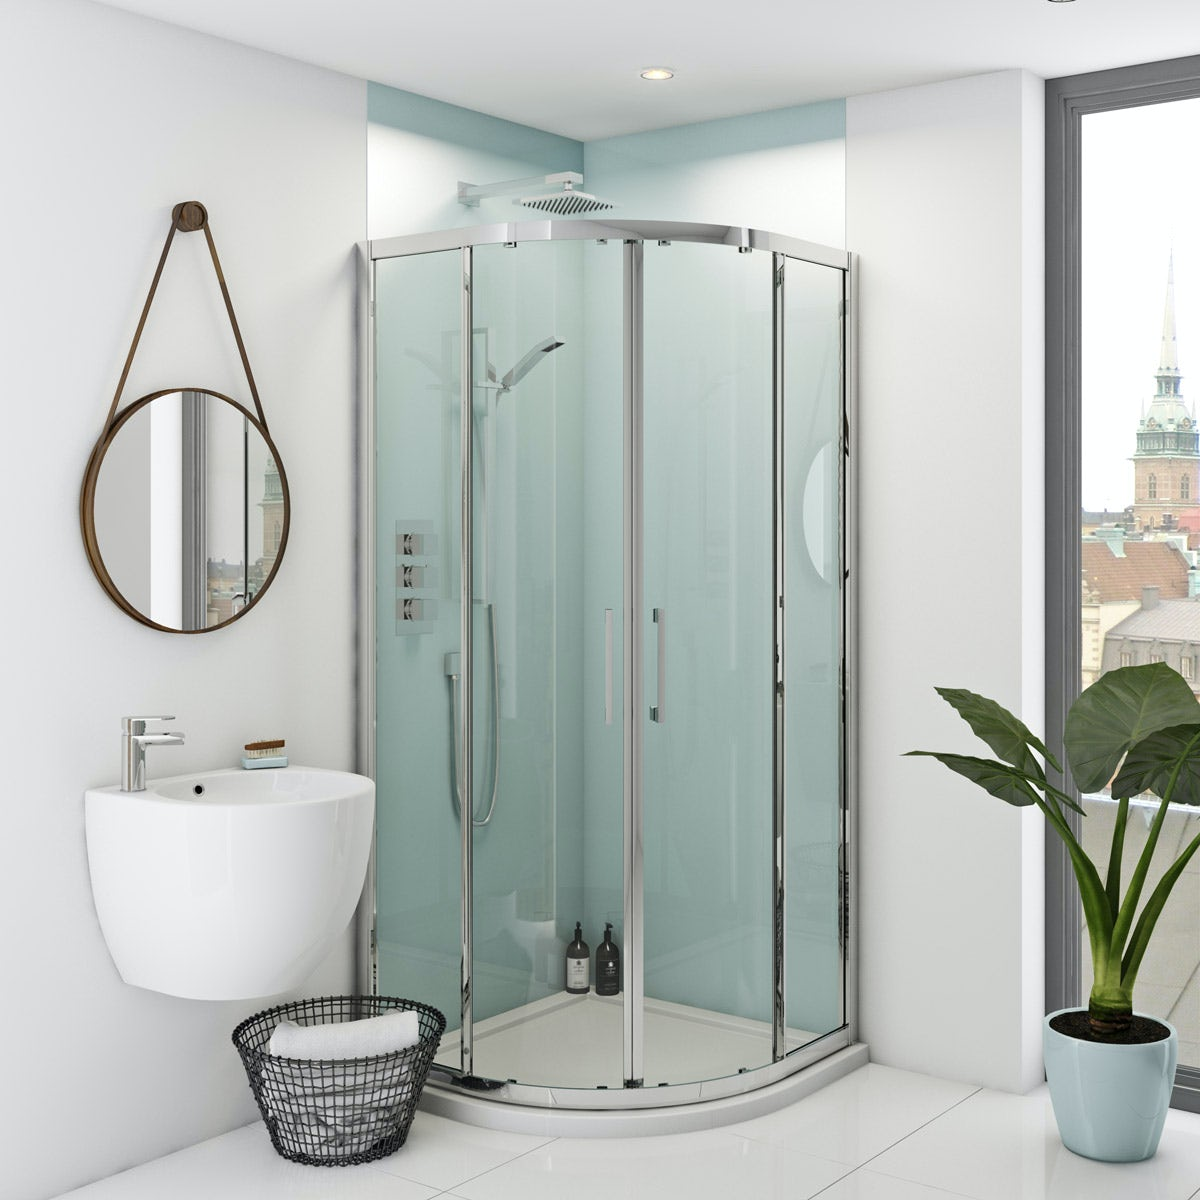 Zenolite plus air acrylic shower wall panel 2440 x 1220